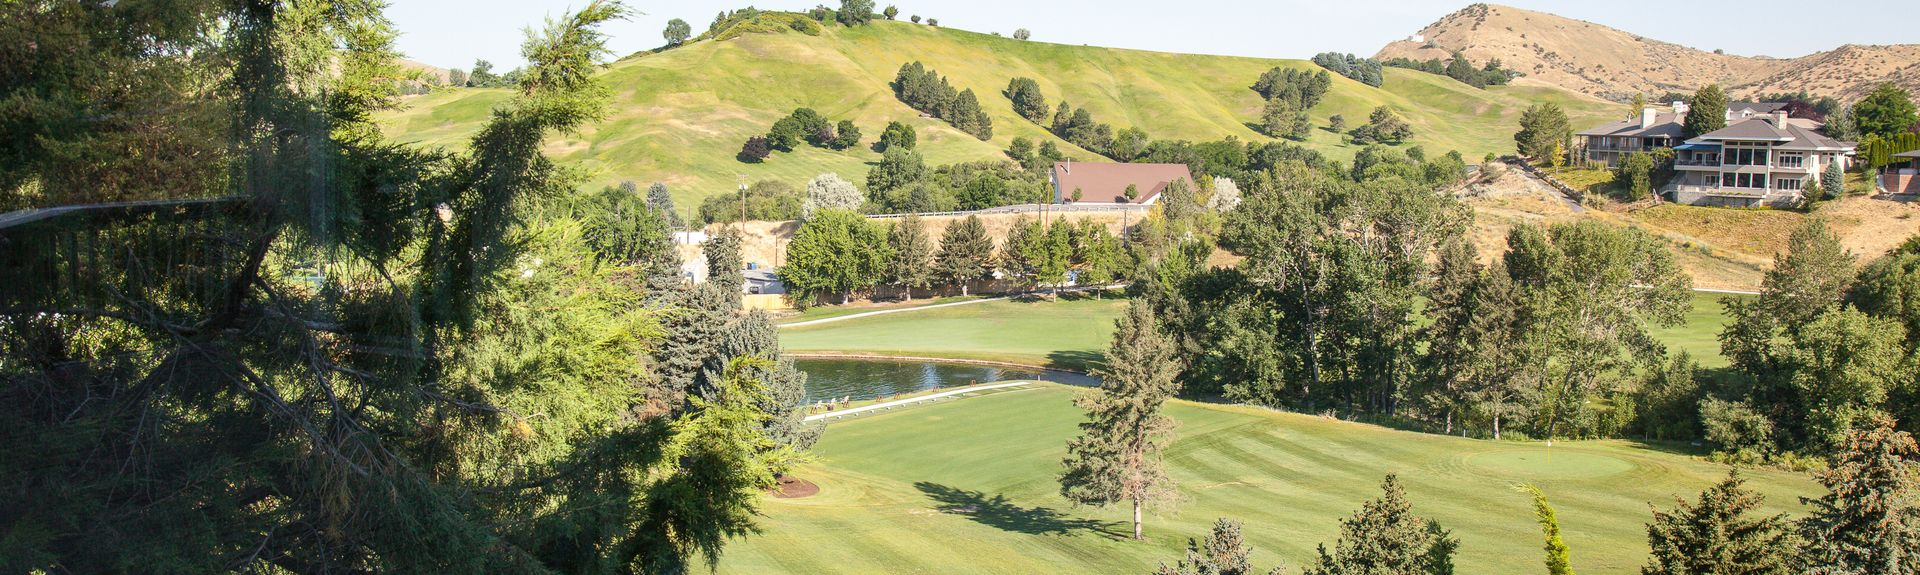 Ridgecrest Golf Club, Nampa, ID, USA